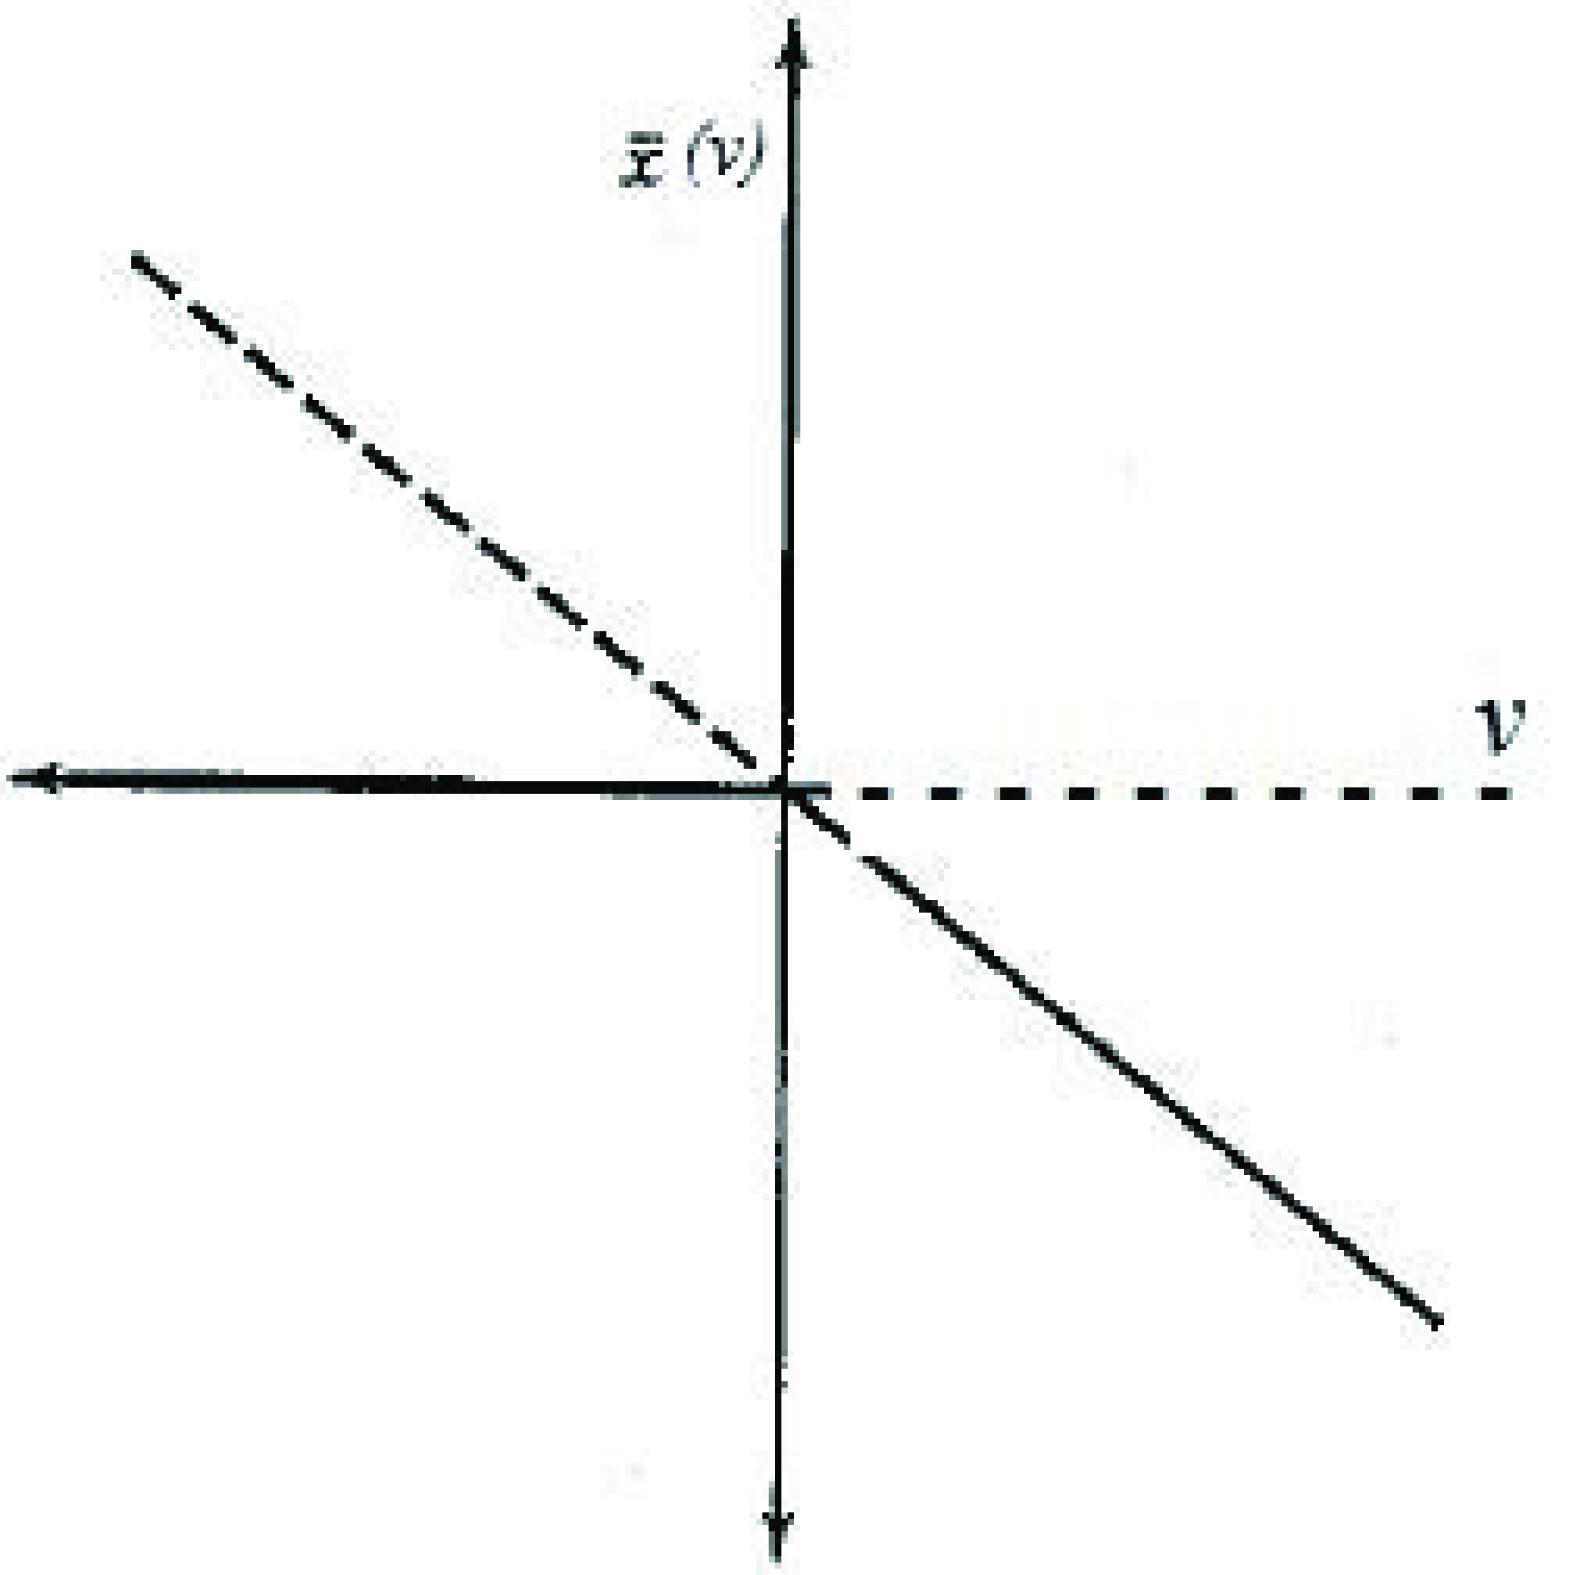 hight resolution of figure 2 bifurcation diagram corresponding